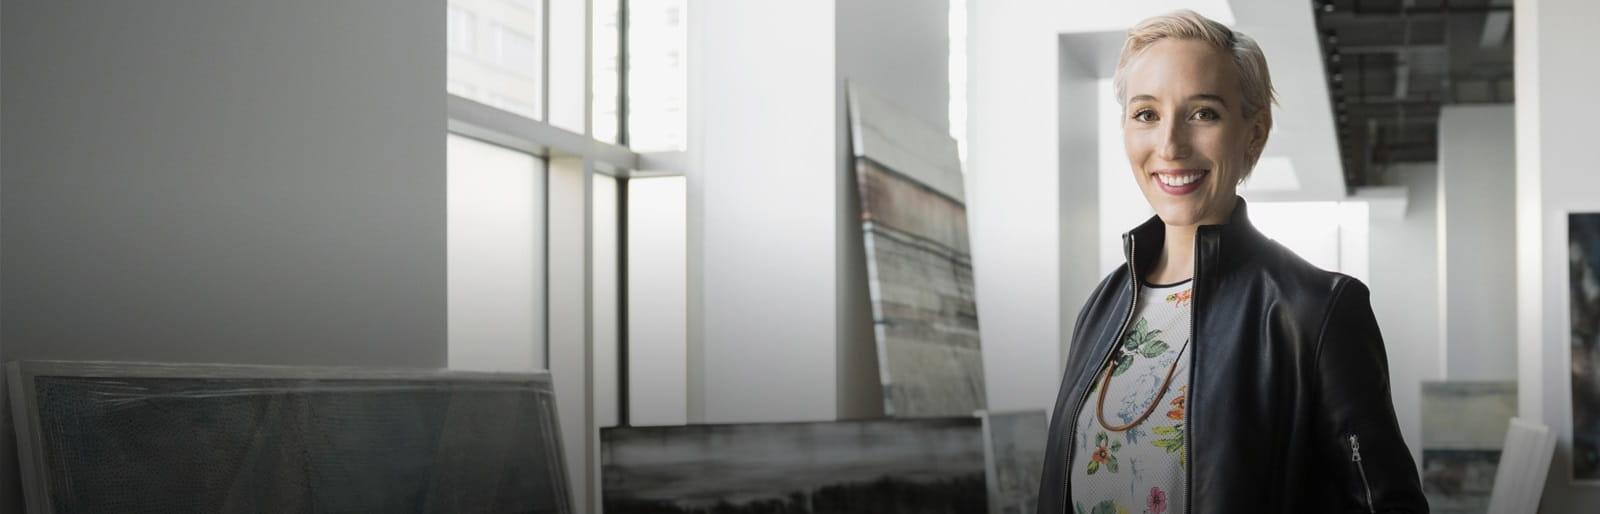 private kunstversicherung ergo ergo. Black Bedroom Furniture Sets. Home Design Ideas